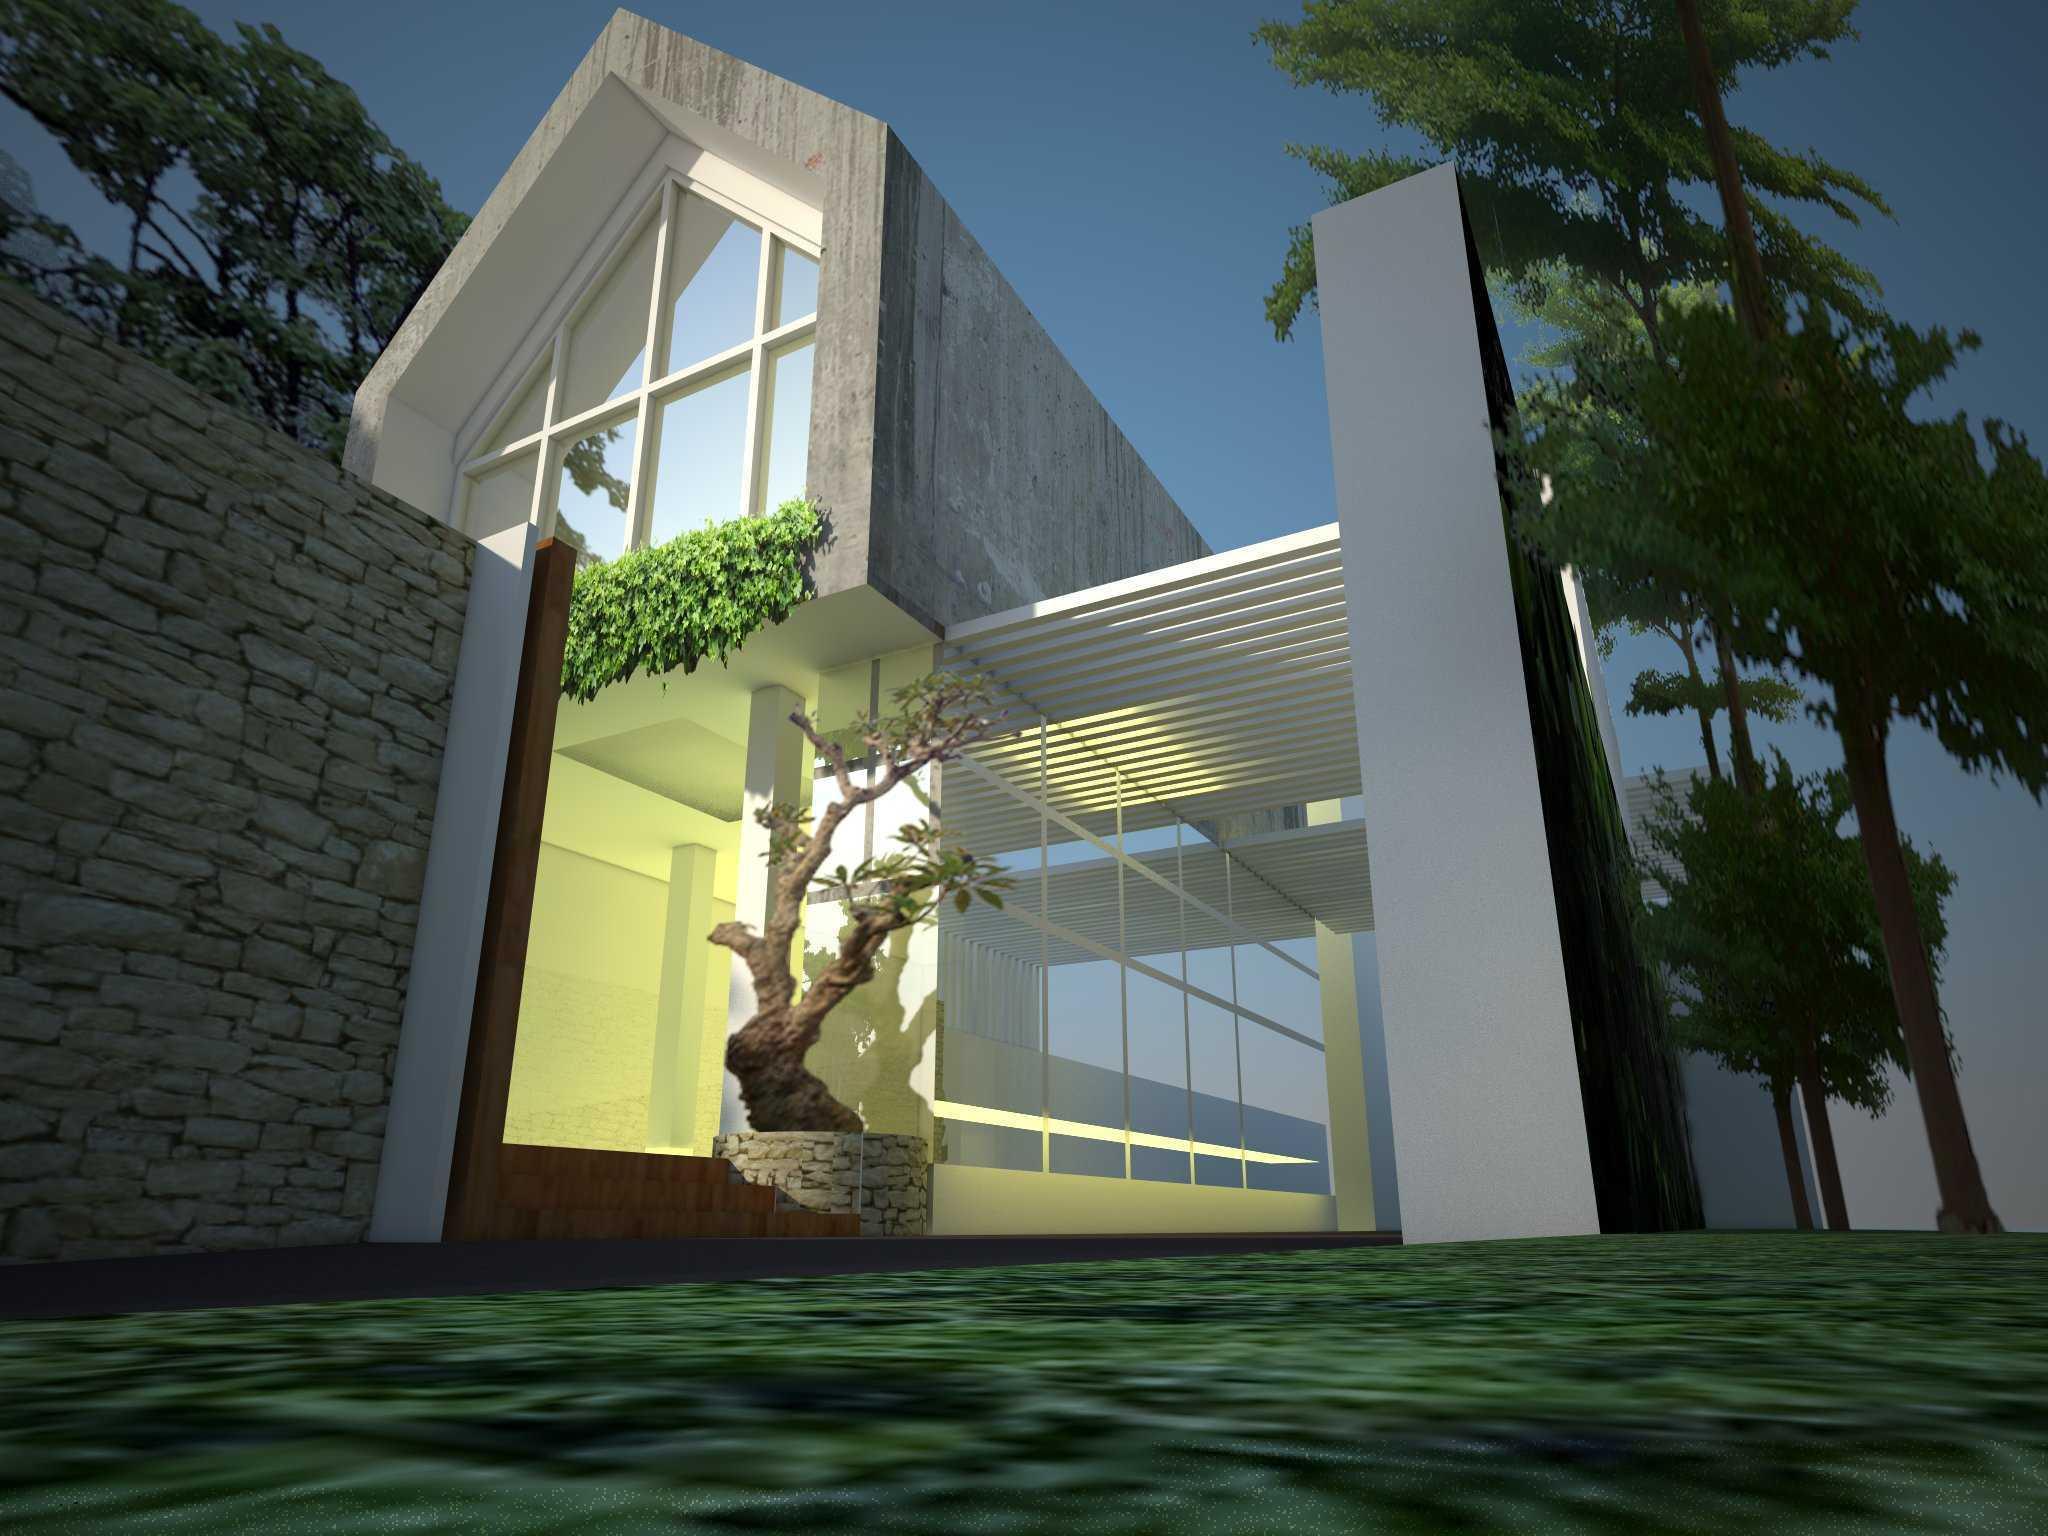 Aditya Wijaya / Studio Indirakasa Villaki Yogyakarta Yogyakarta Front Entrance Tropis  15698